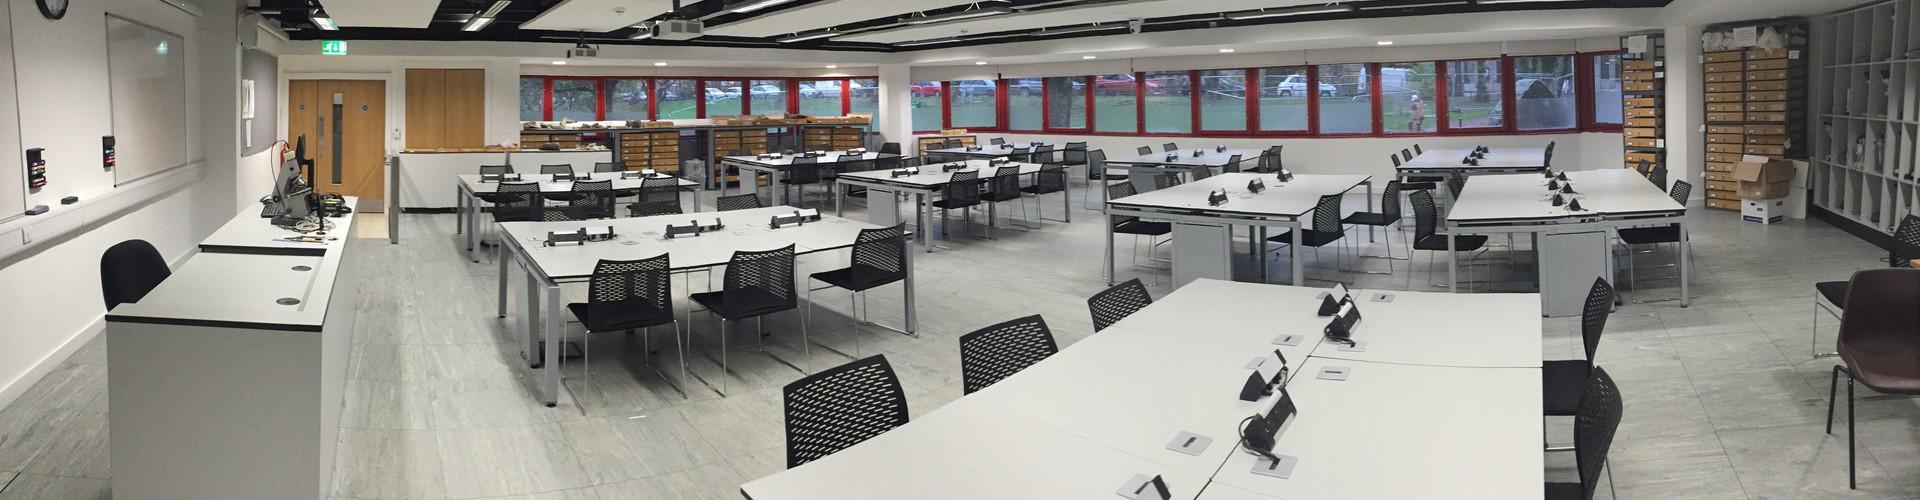 A teaching classroom (Credit: Gordon Curry)